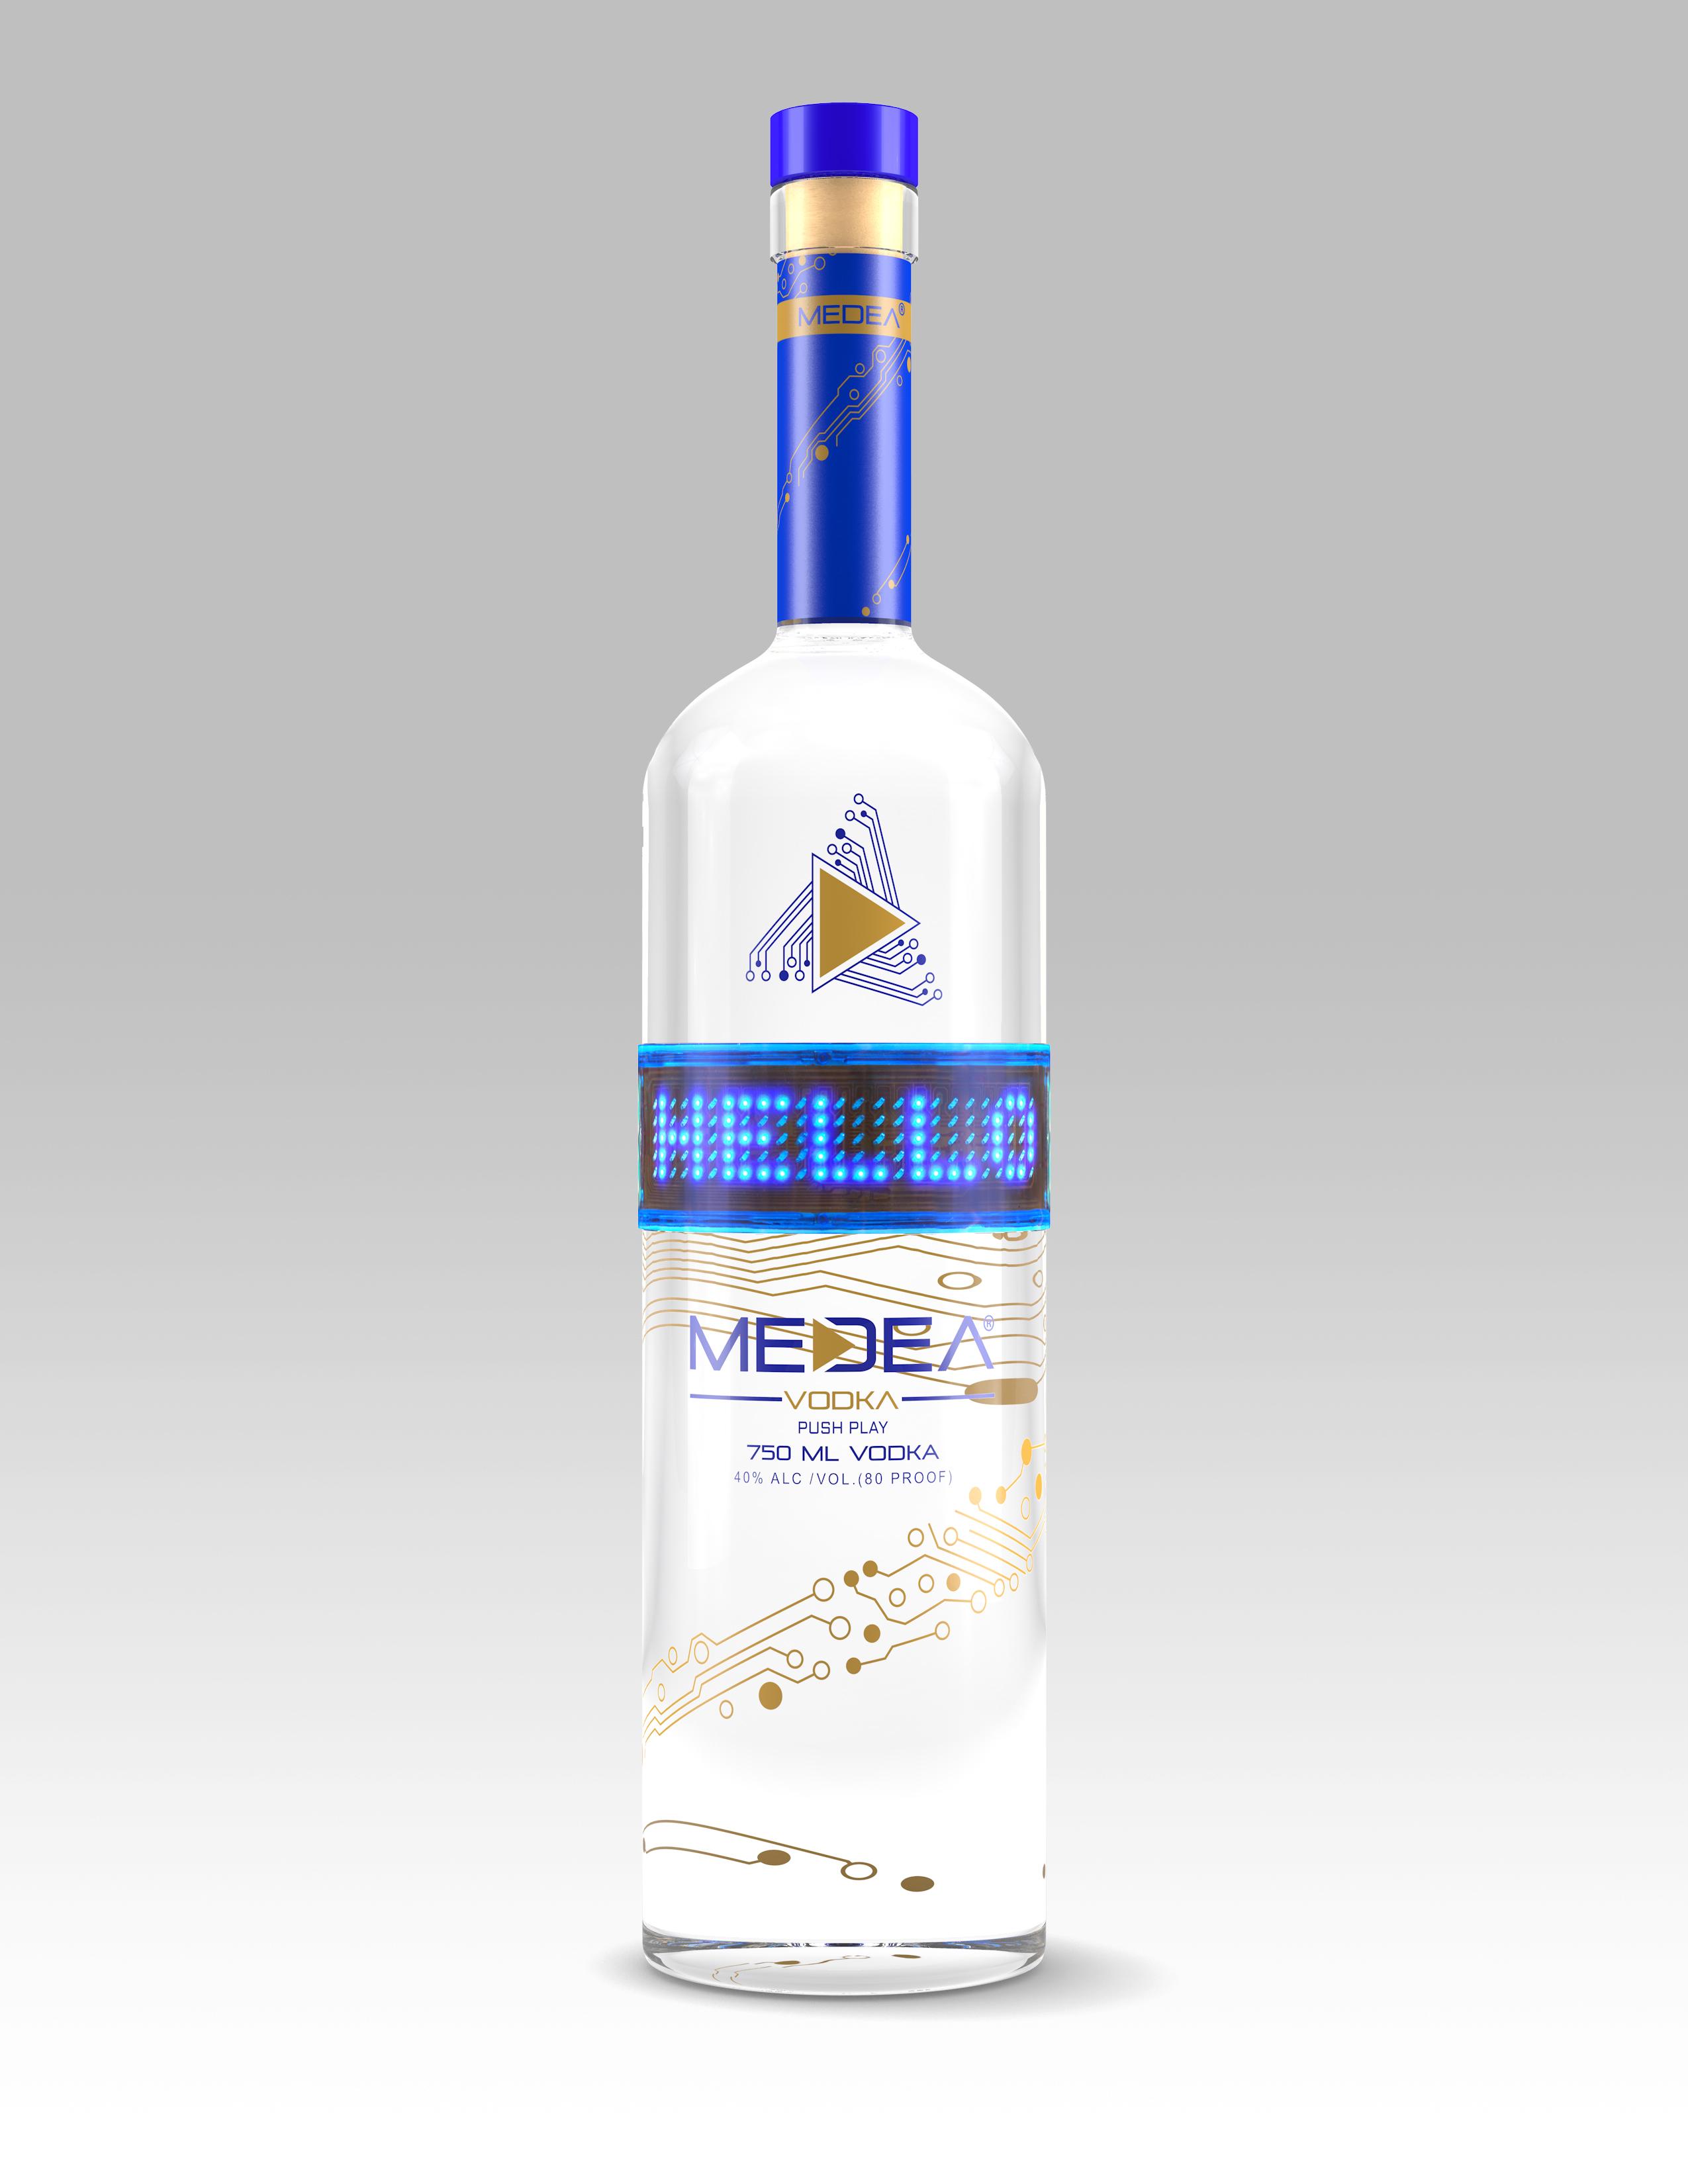 vodka_studio04-03 copy